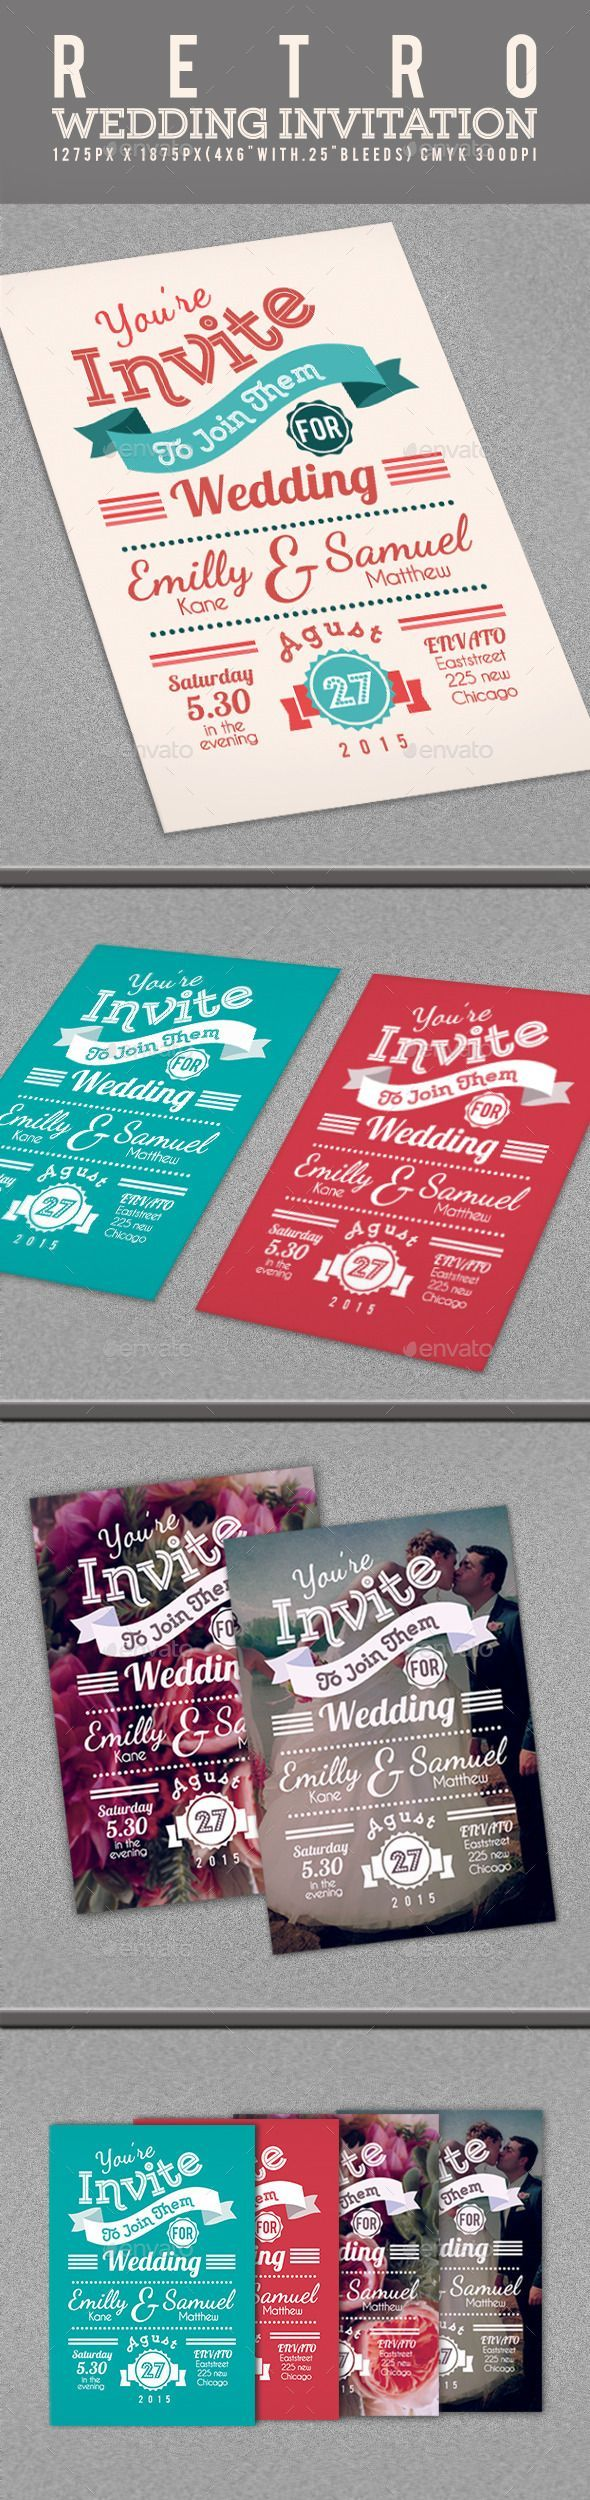 vintage wedding card design template%0A Retro Wedding Invitation  Retro Wedding Invitation Template  design